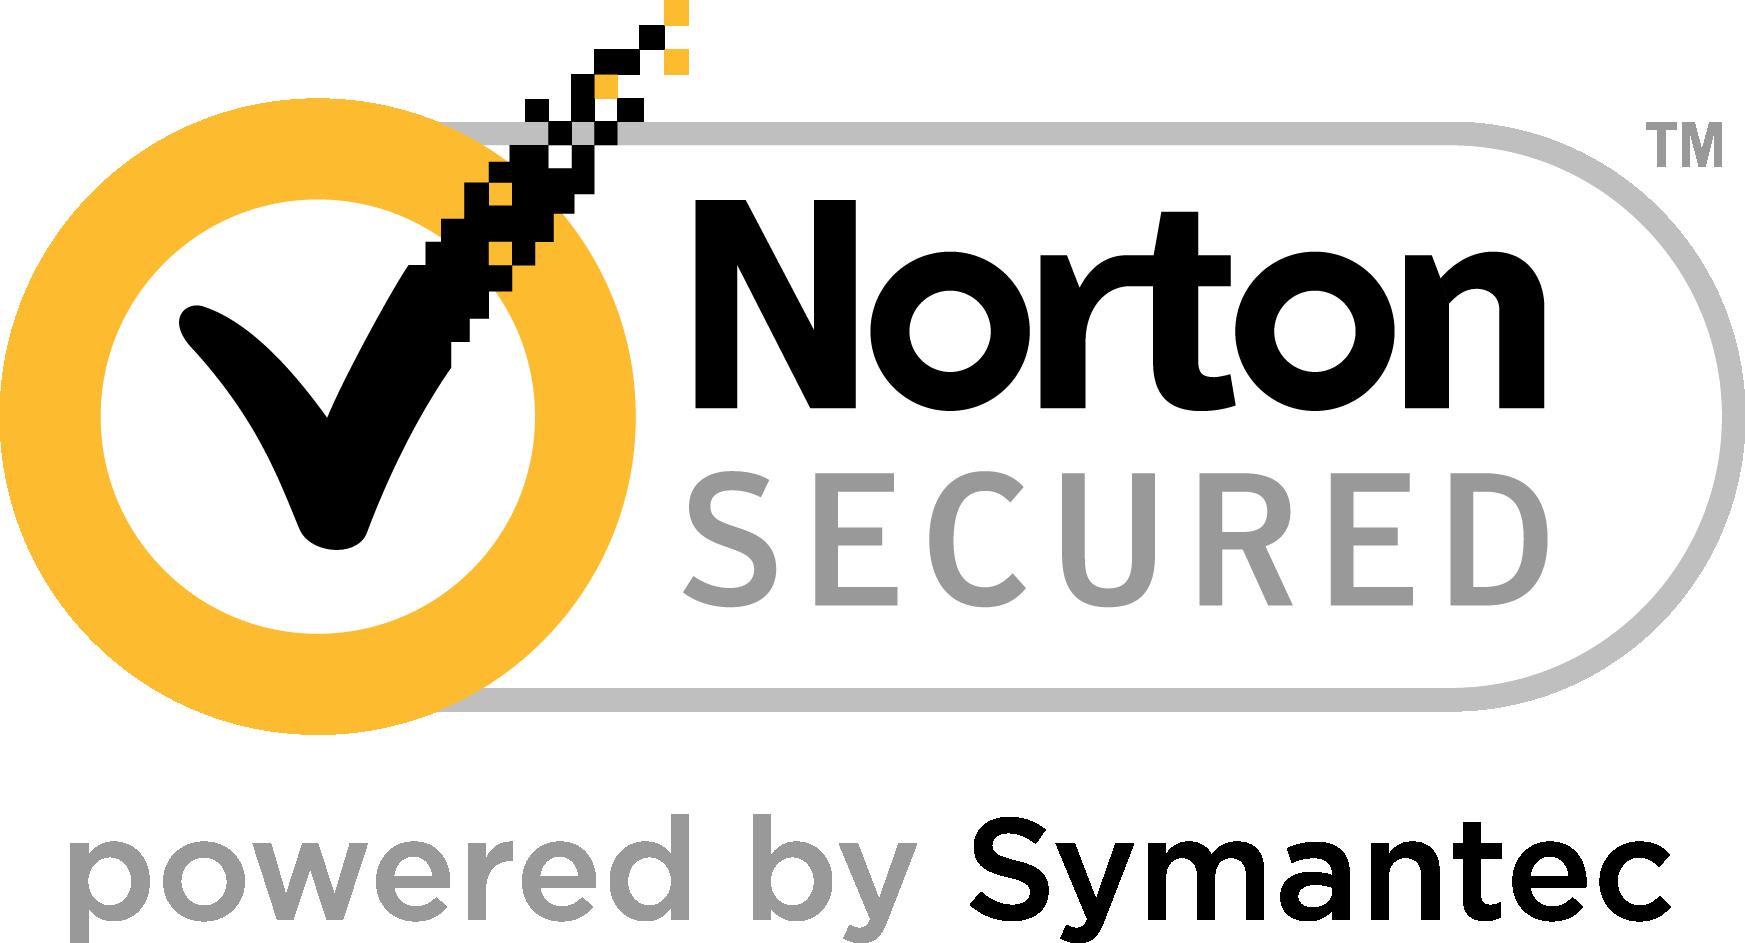 110-1105880_secure-checkout-norton-secured-logo-png